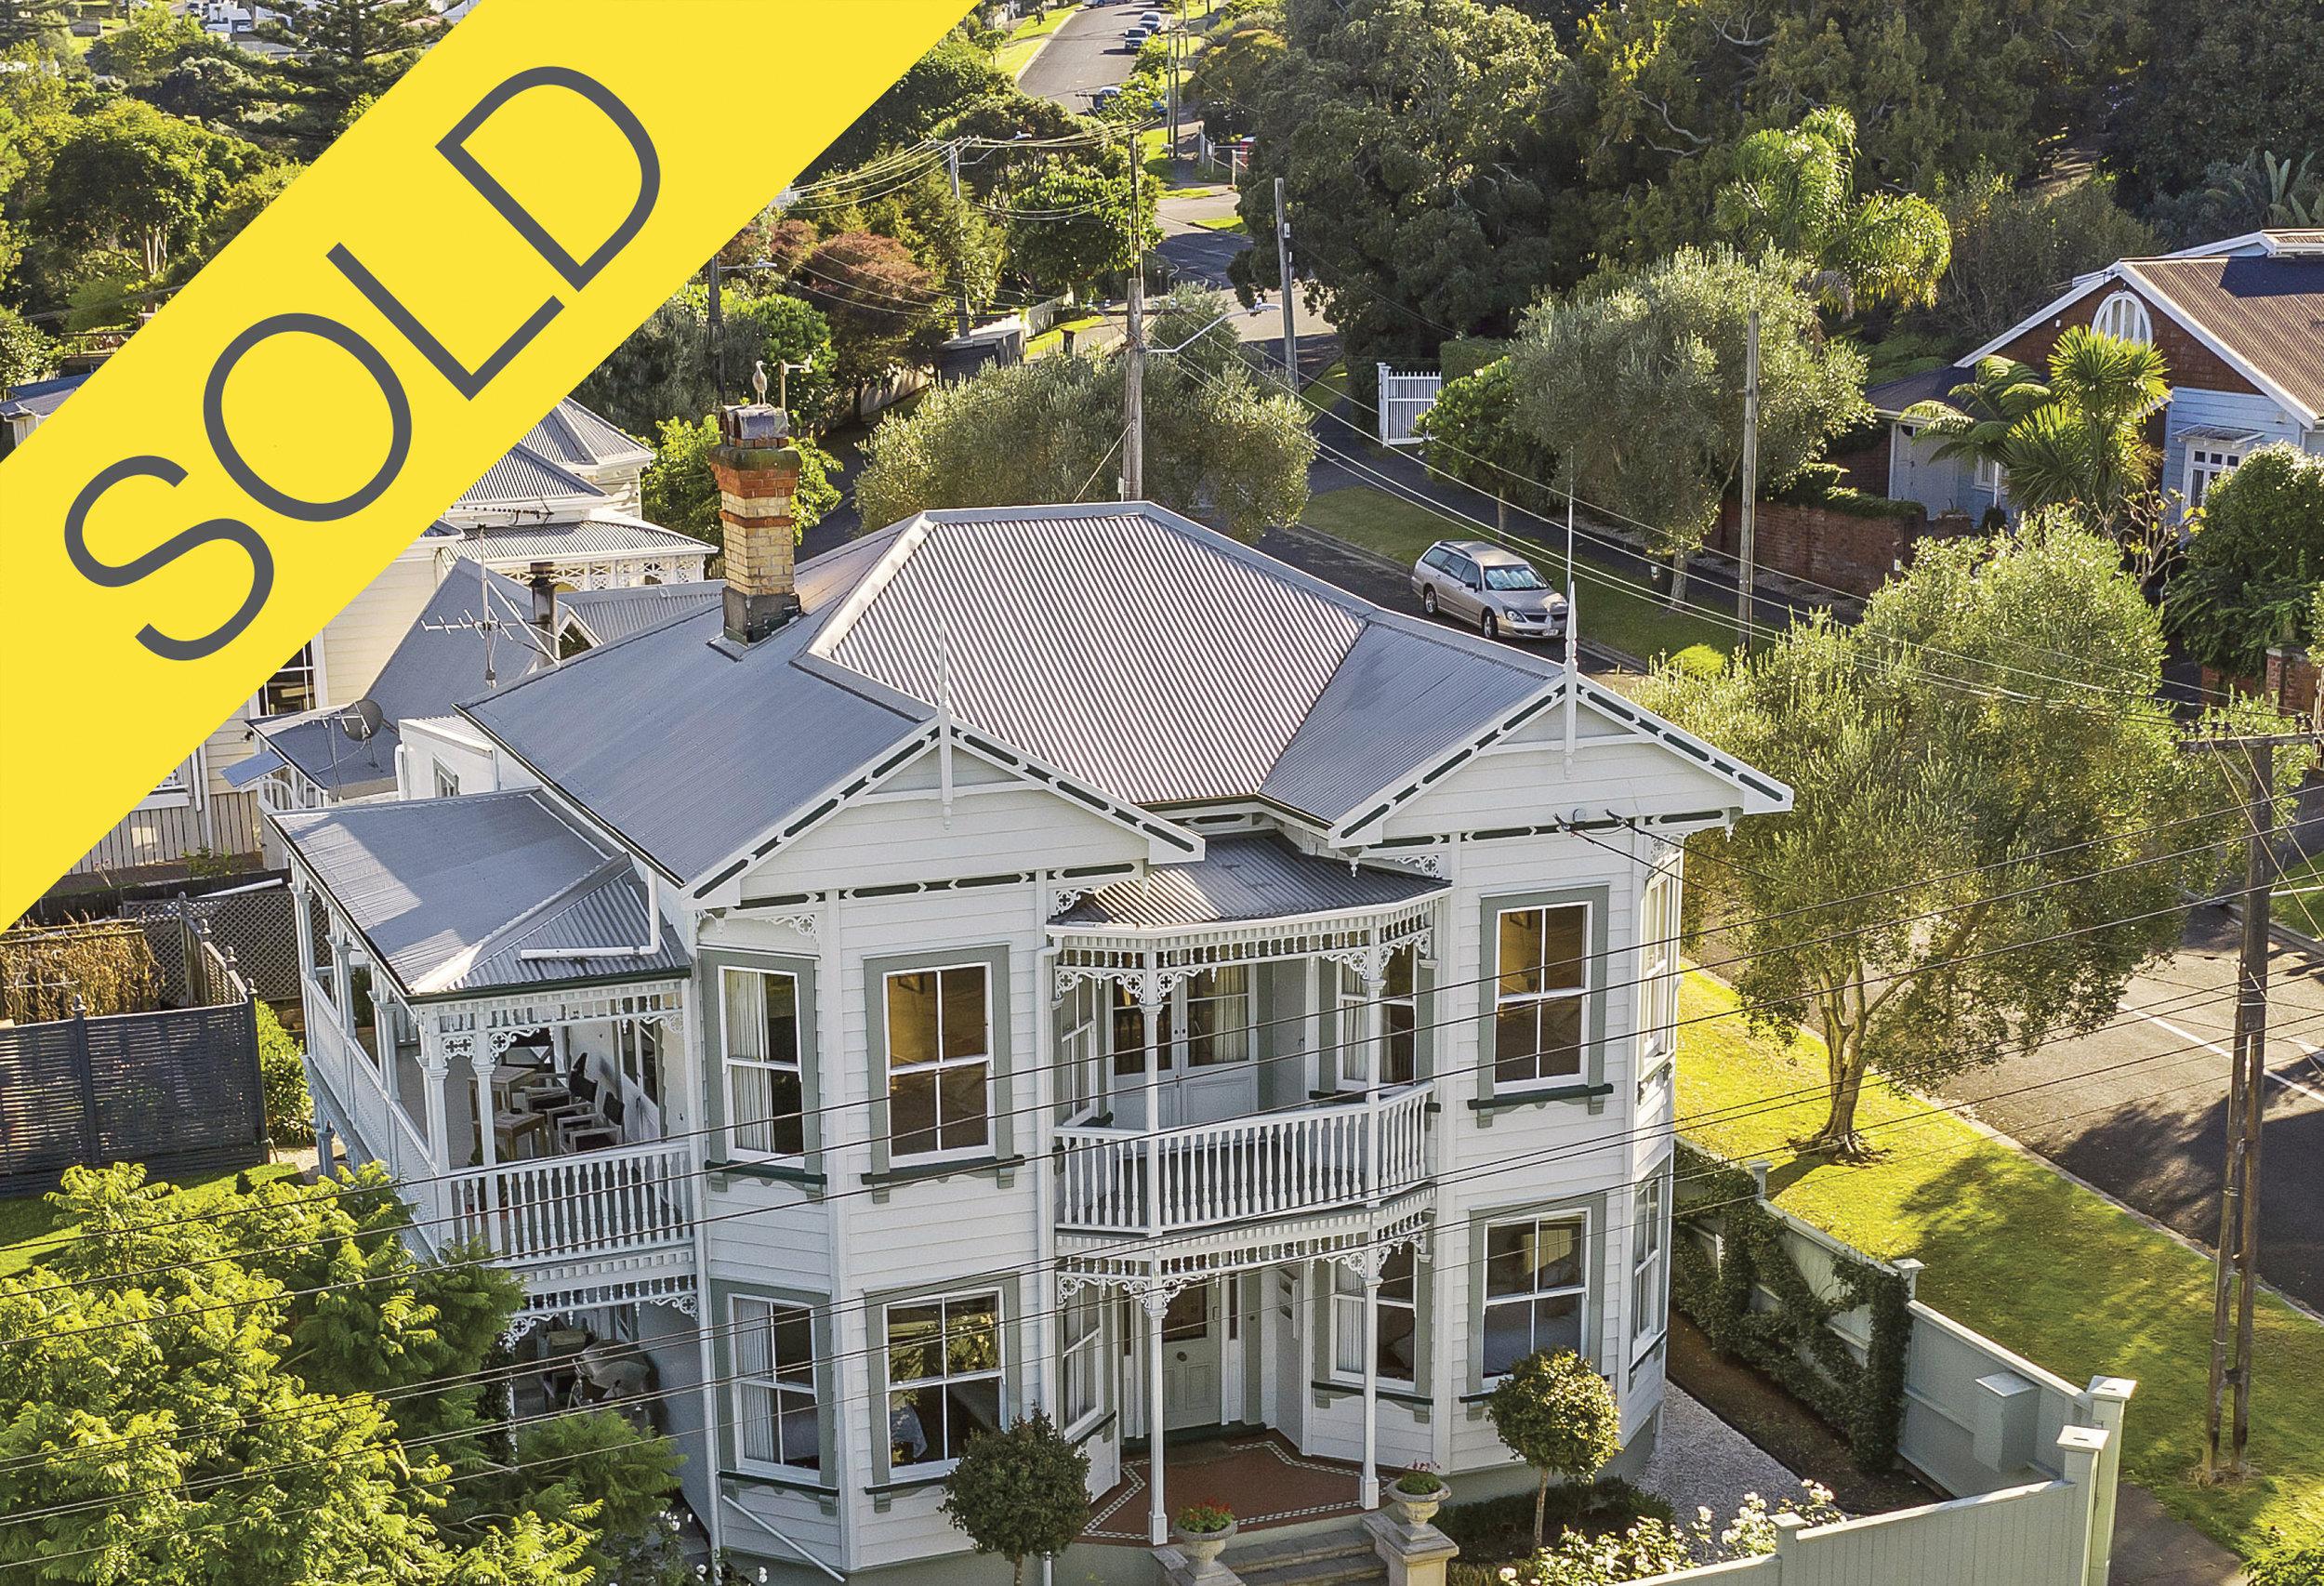 2 Symonds Street, Onehunga, Auckland - SOLD JULY 20194 Beds I 2 Baths I 6 Cars